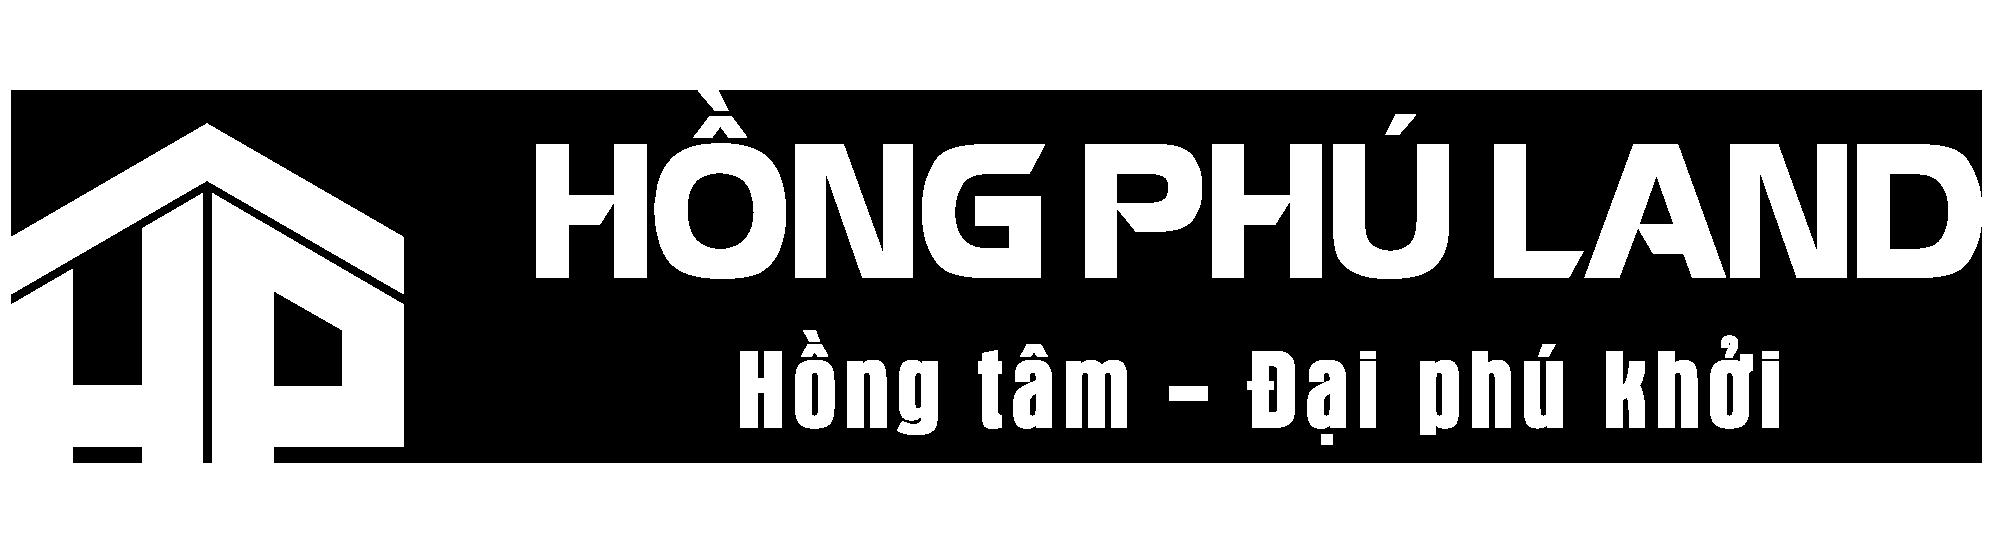 Hồng Phú Land